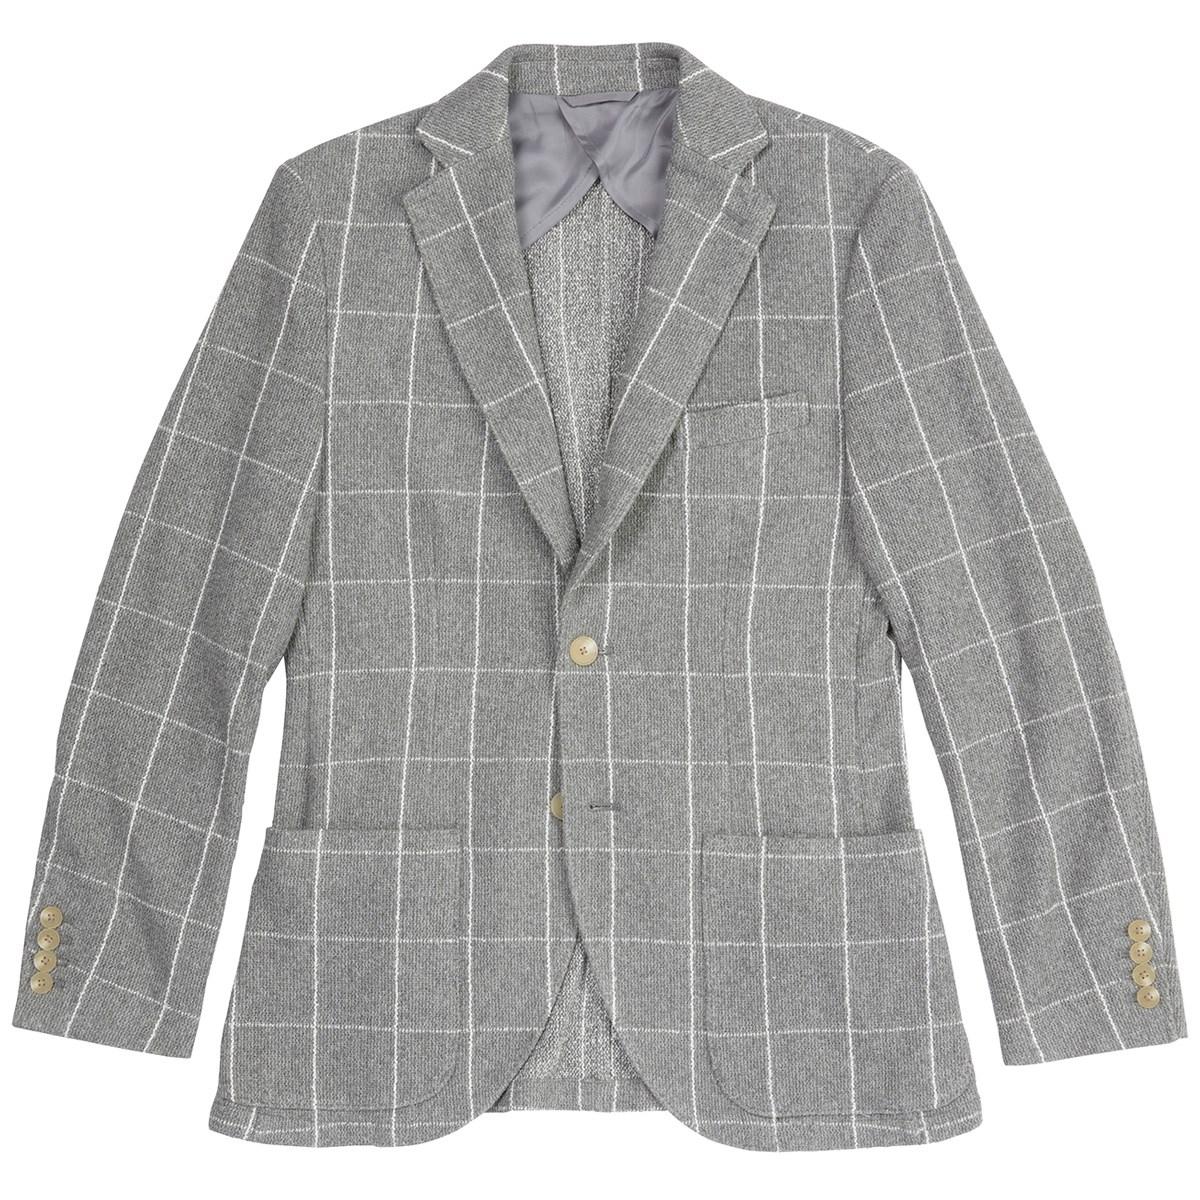 GDO オリジナル ブークレージャカードジャケット